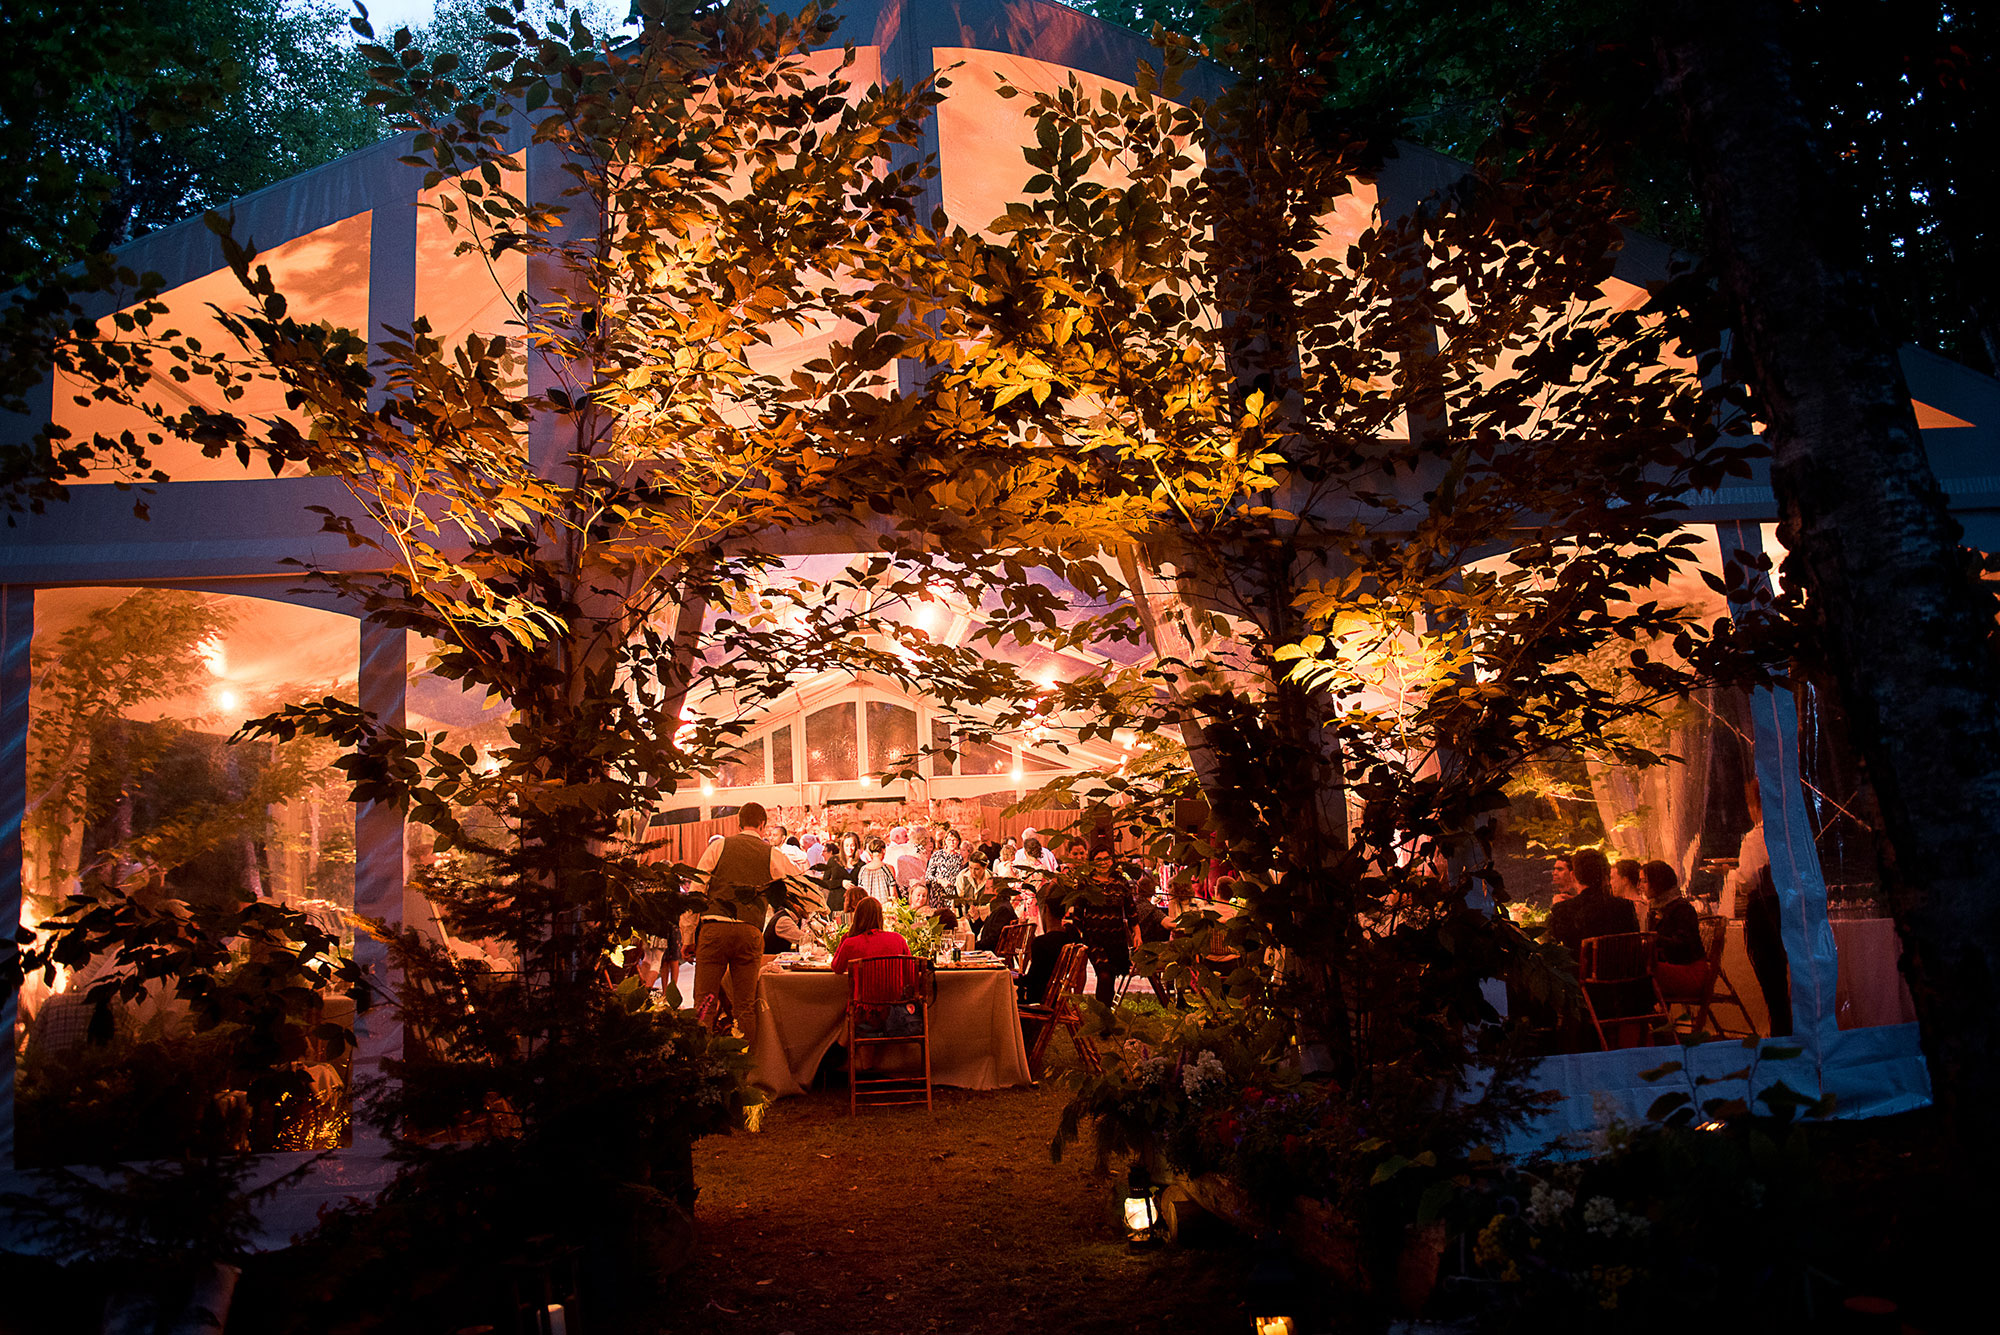 adirondack_tent_wedding_in_the_woods.jpg